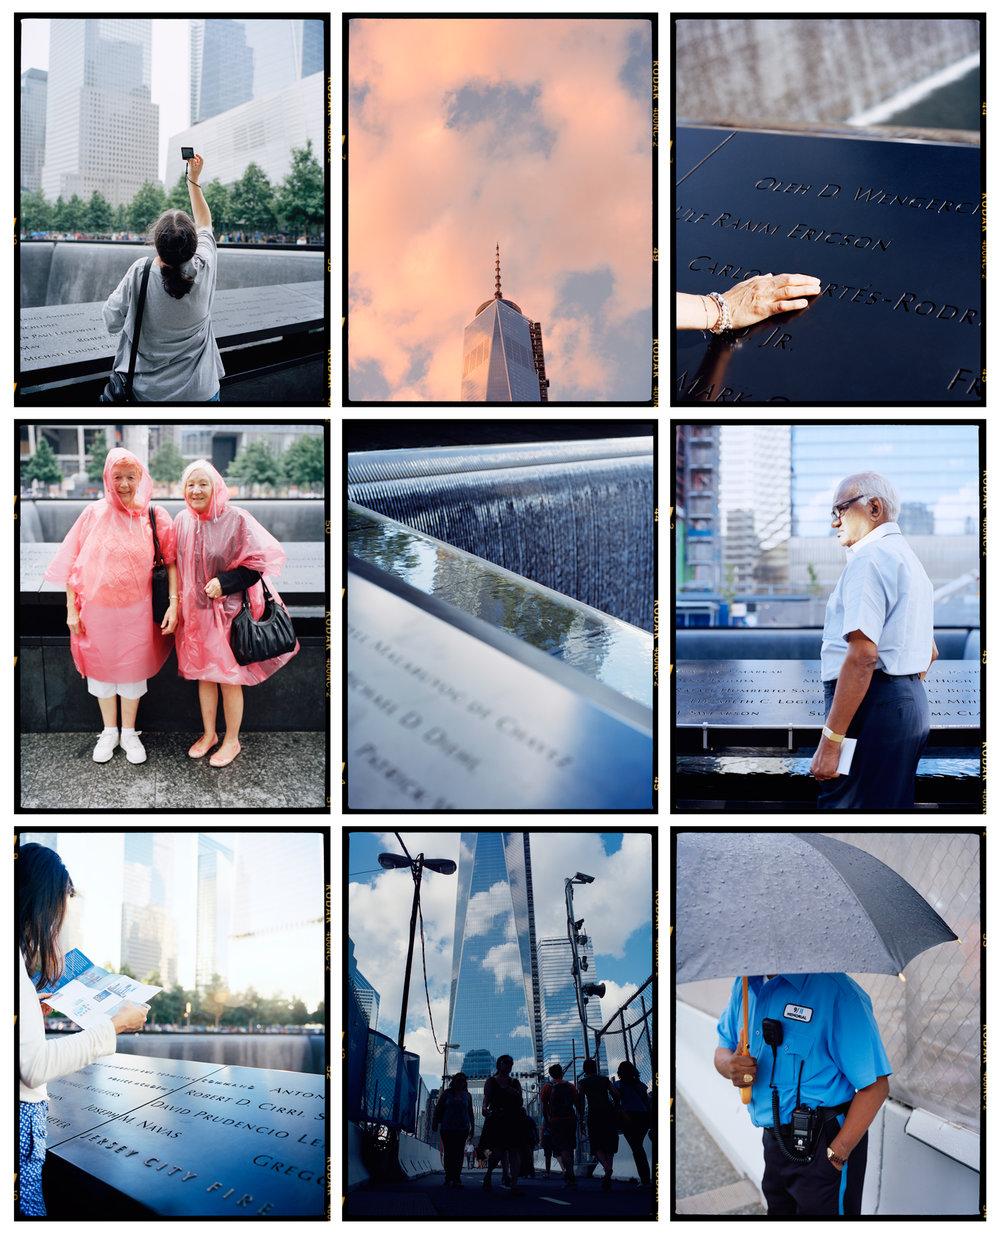 9-11 MEMORIAL//FAST COMPANY